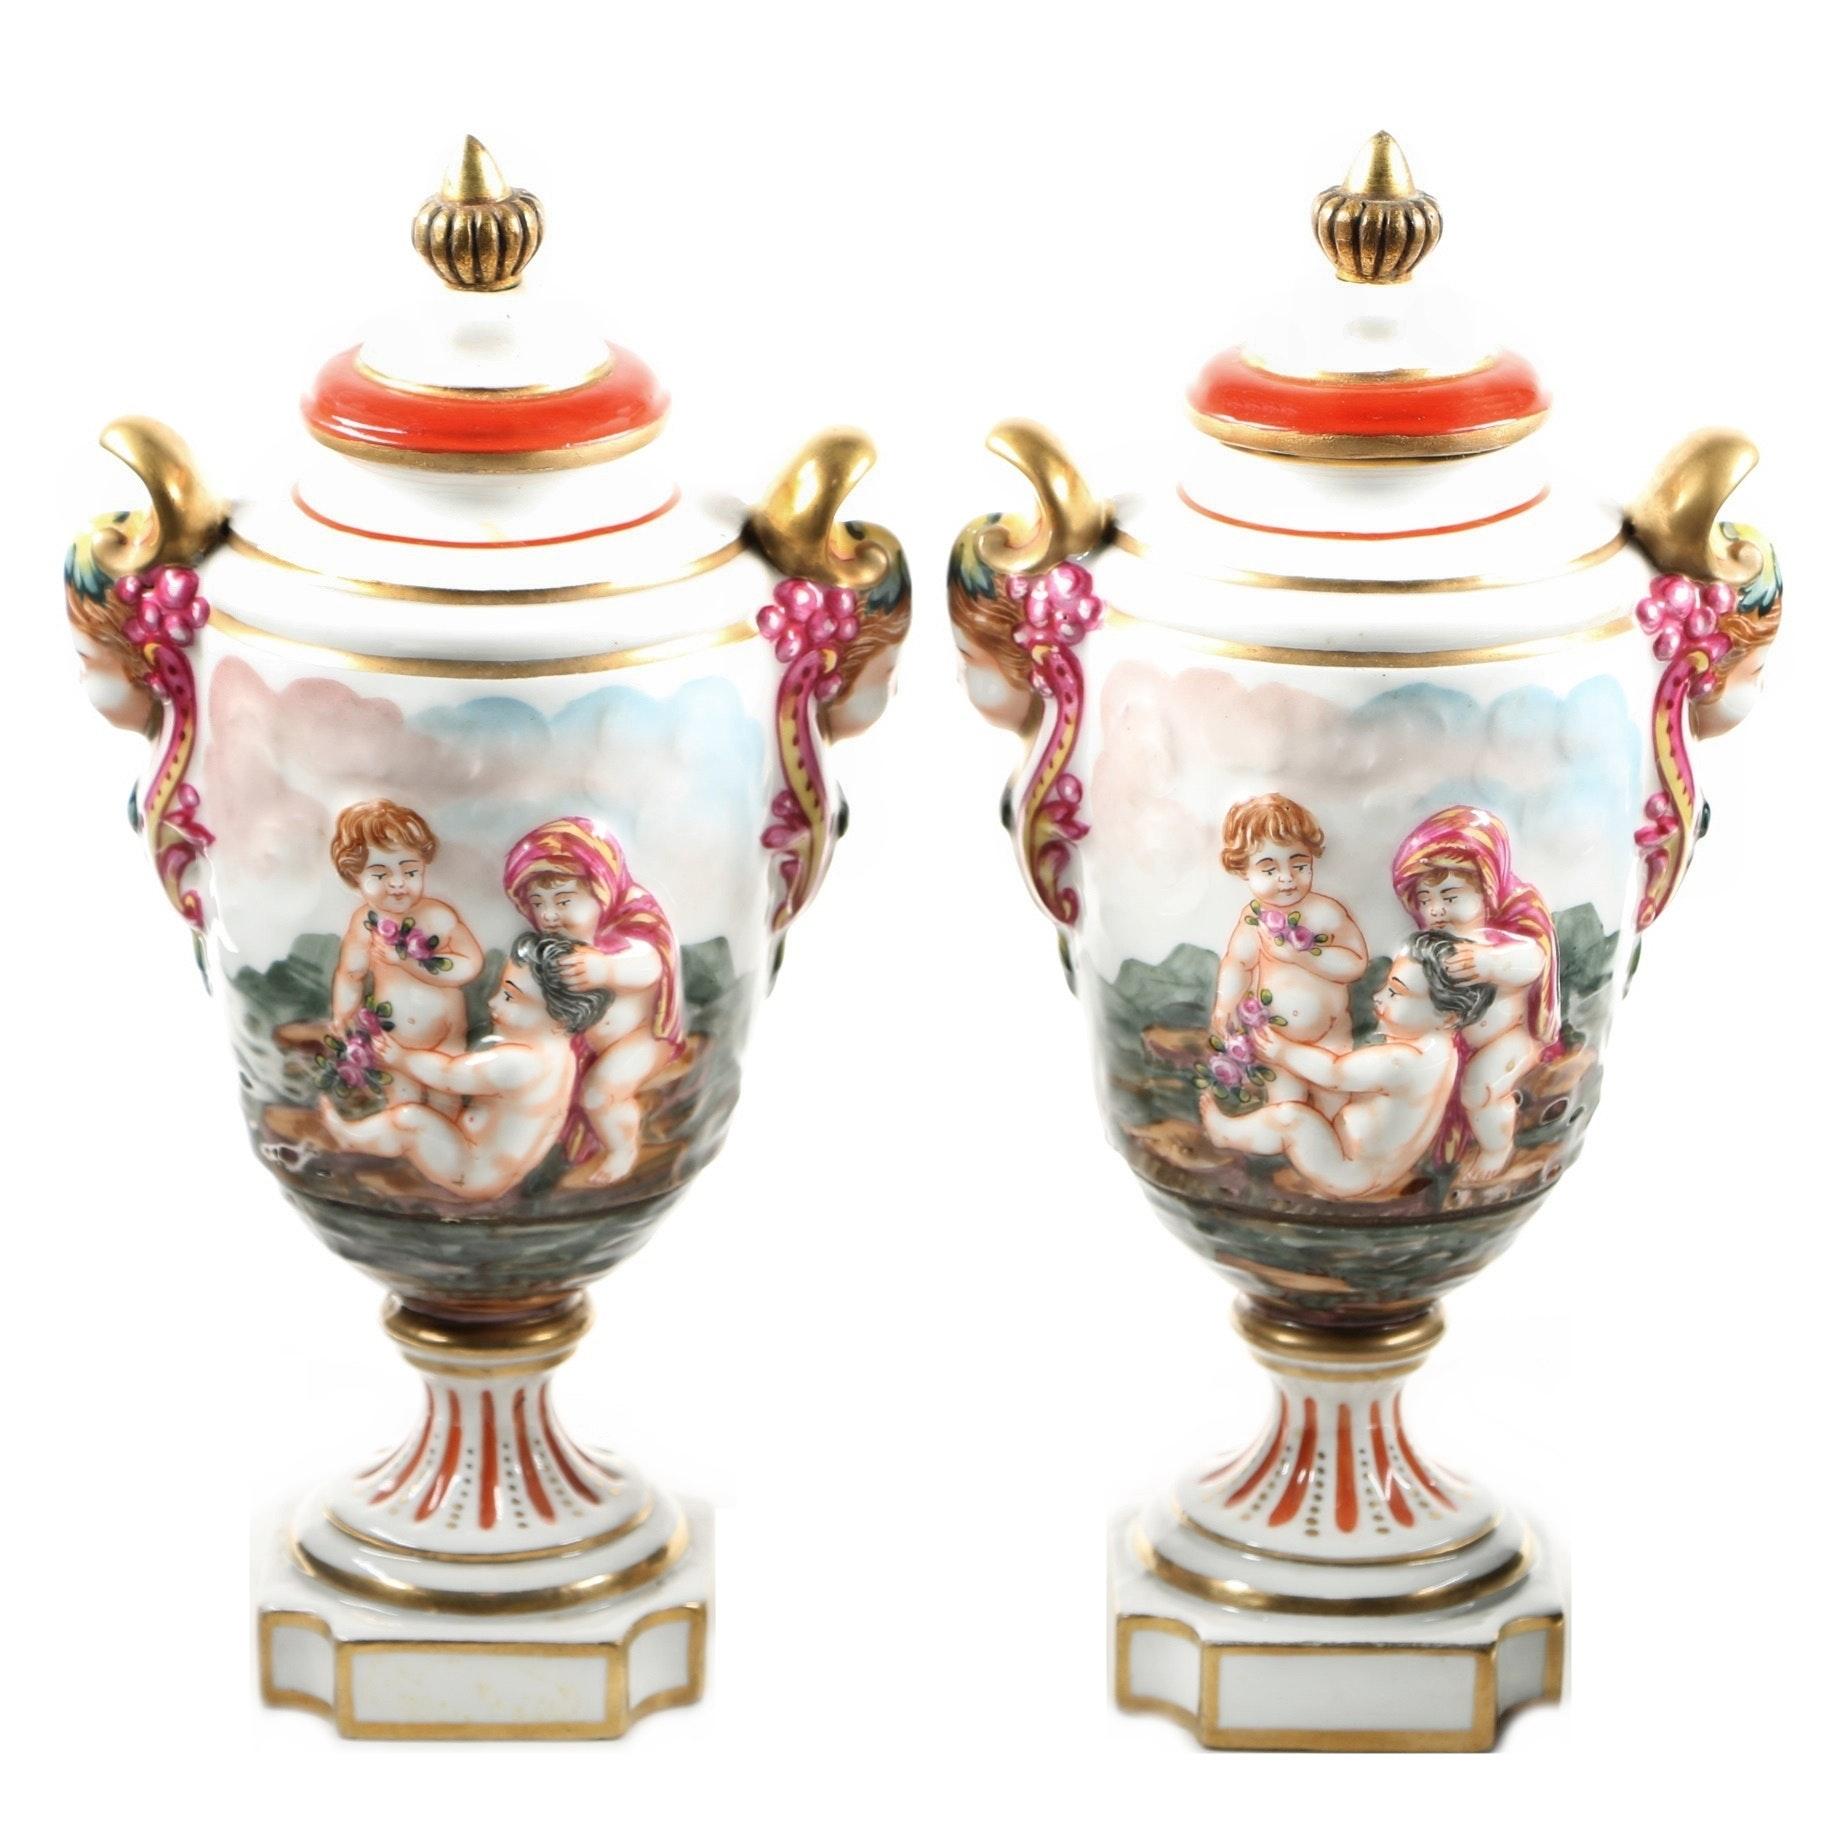 Pair of Circa 1915 French Capodimonte Figural Urns